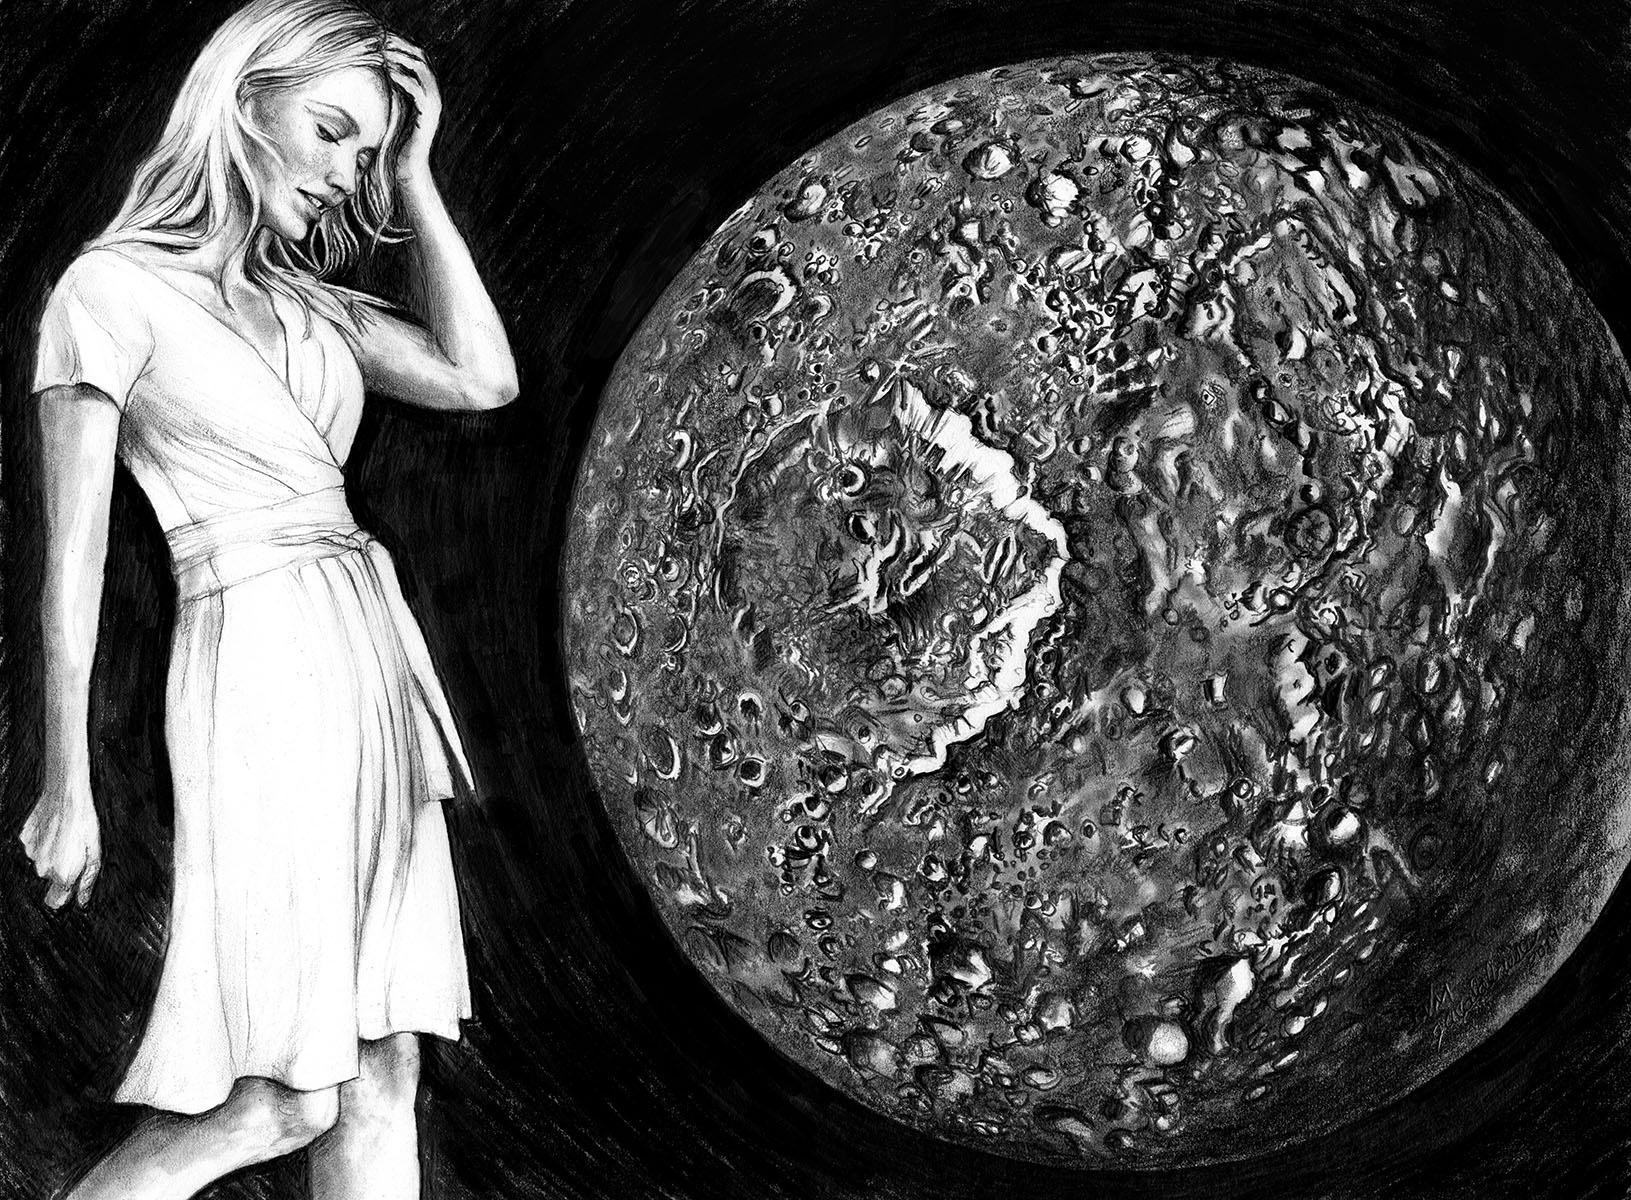 Dance of the Spheres - Mimas